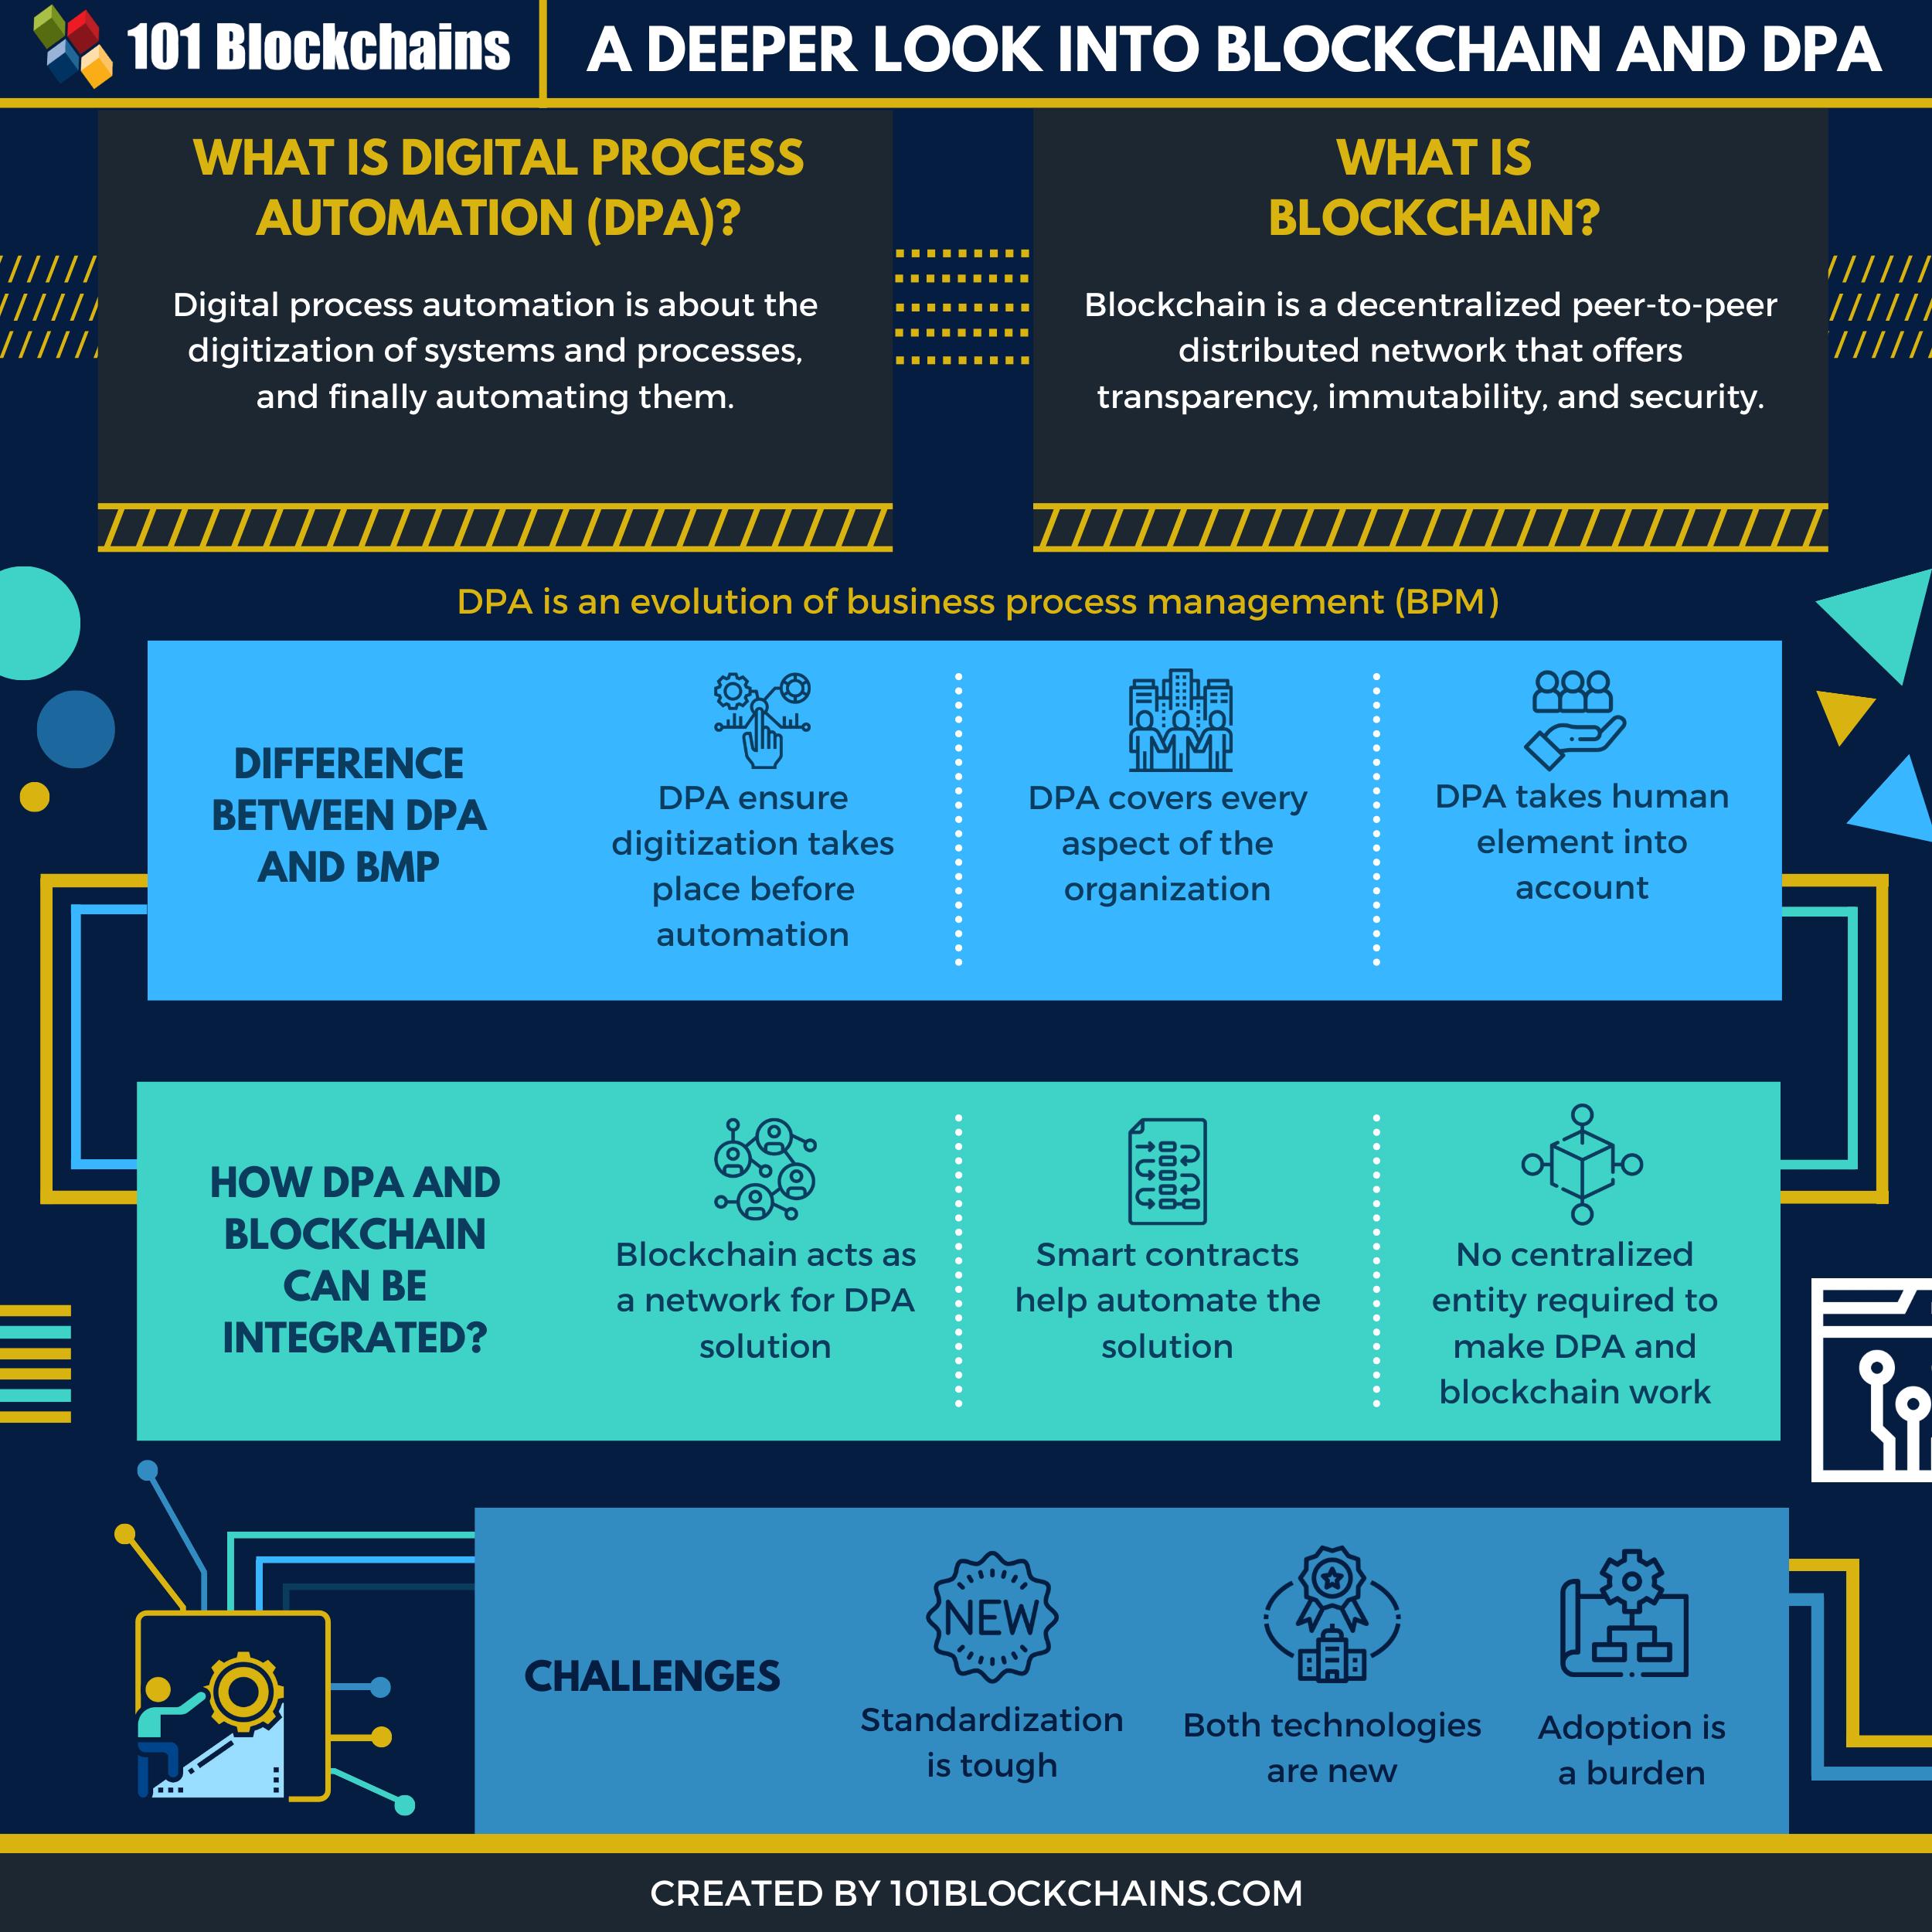 Blockchain and DPA